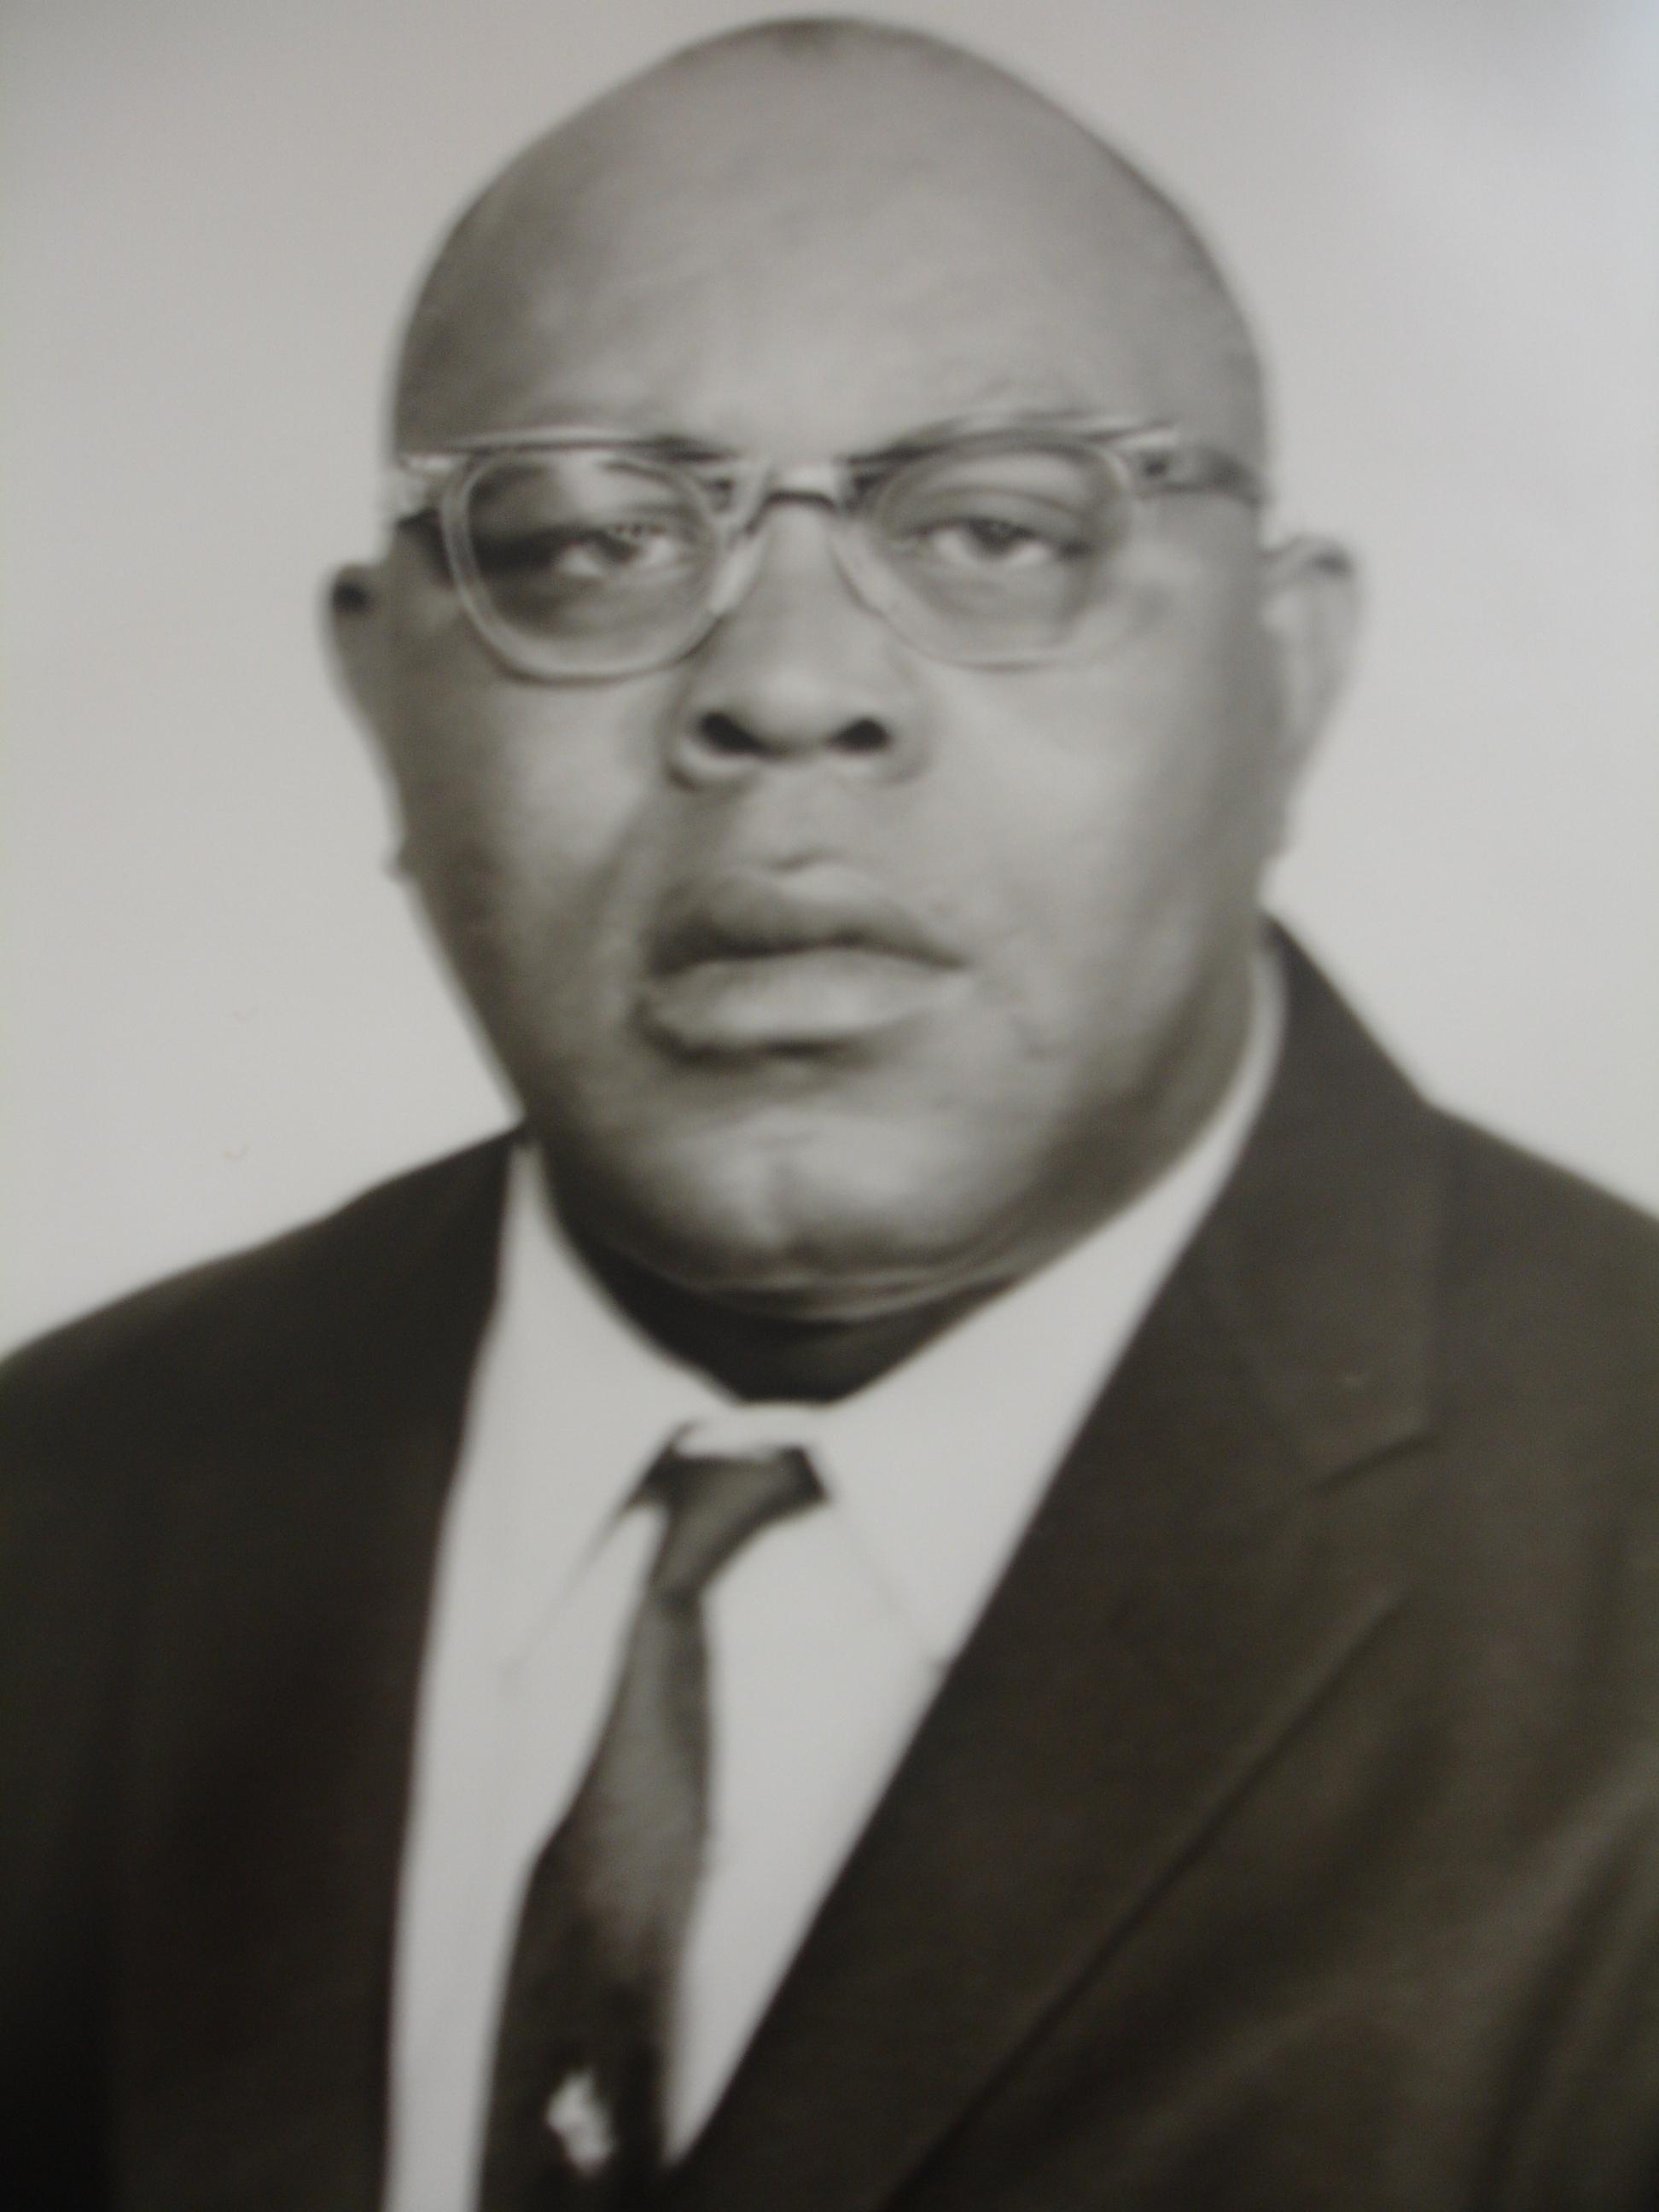 Rev. A L. McBeth 1960 - 1964